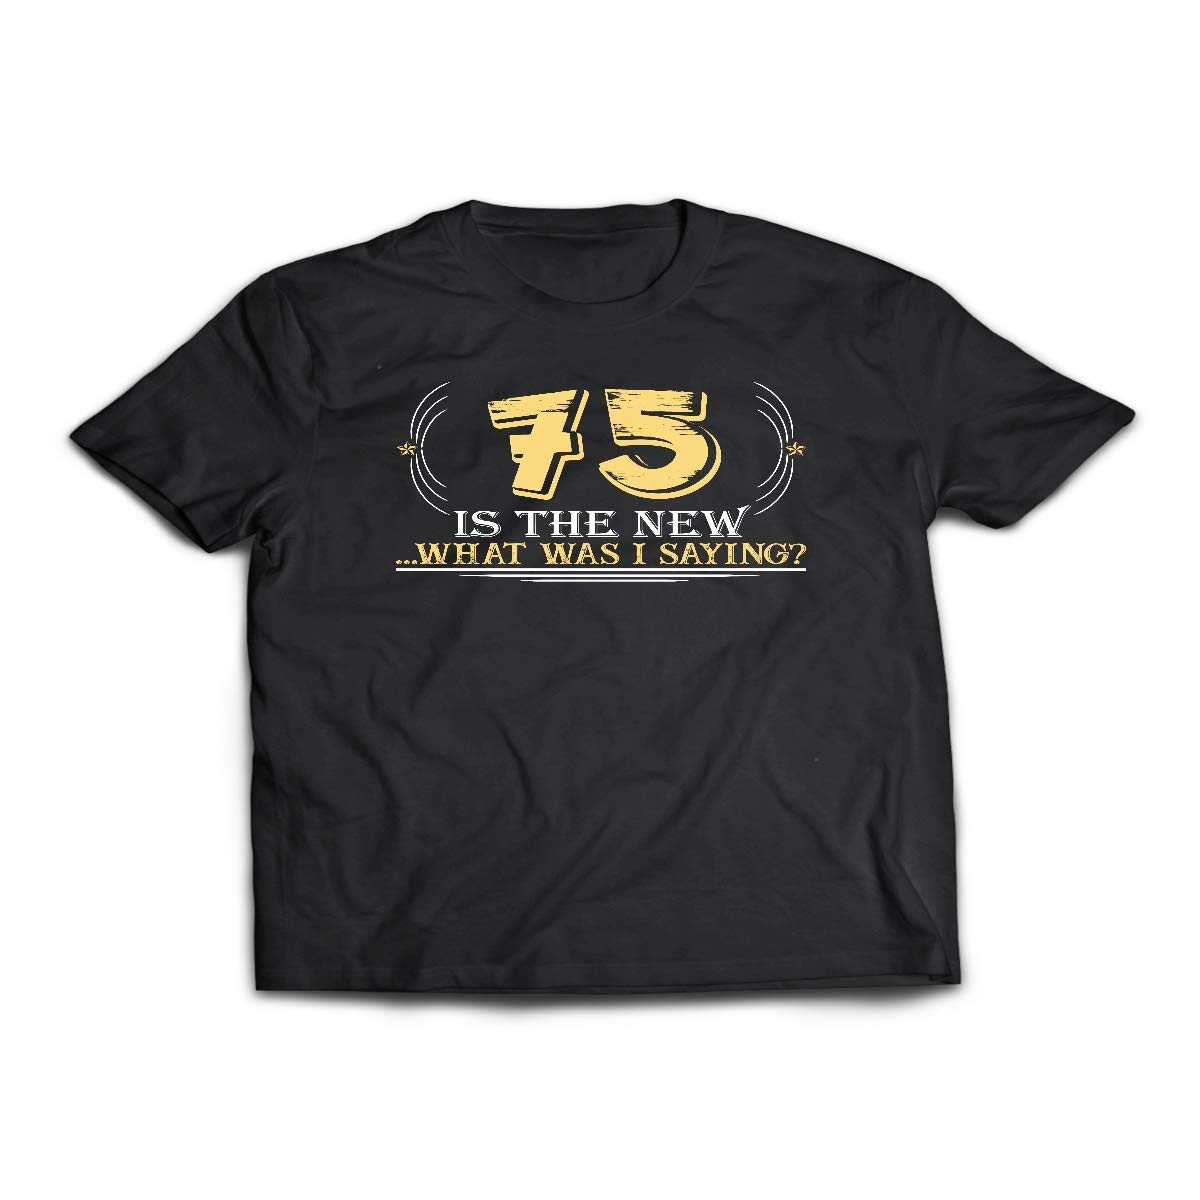 75th Birthday Gift The New 75 Gag Birthday Joke Gift Idea 9229 Shirts